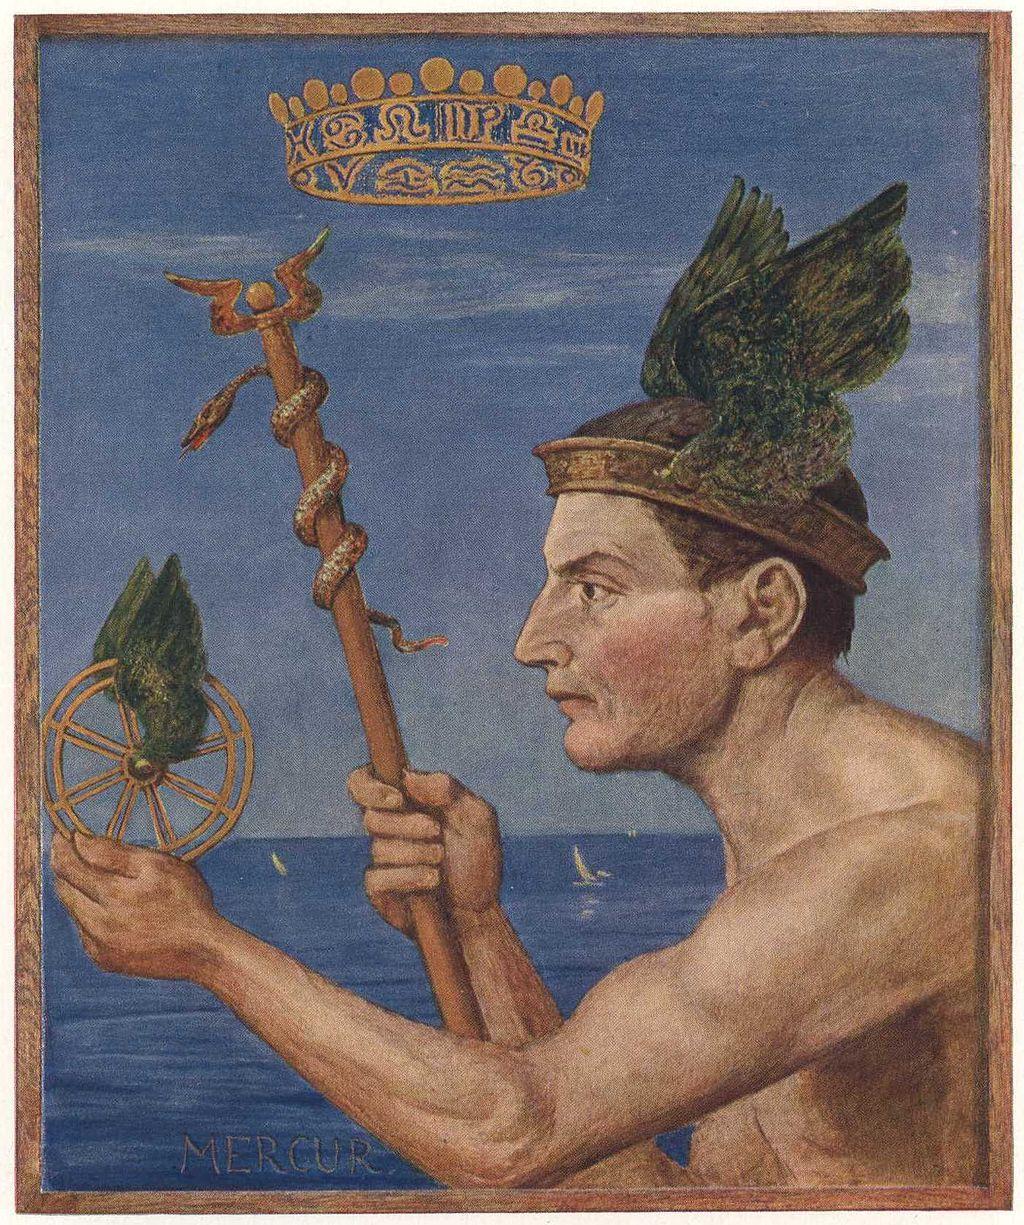 Mercurius litteras CIceronis affert. Learn Latin with Latinitium.com